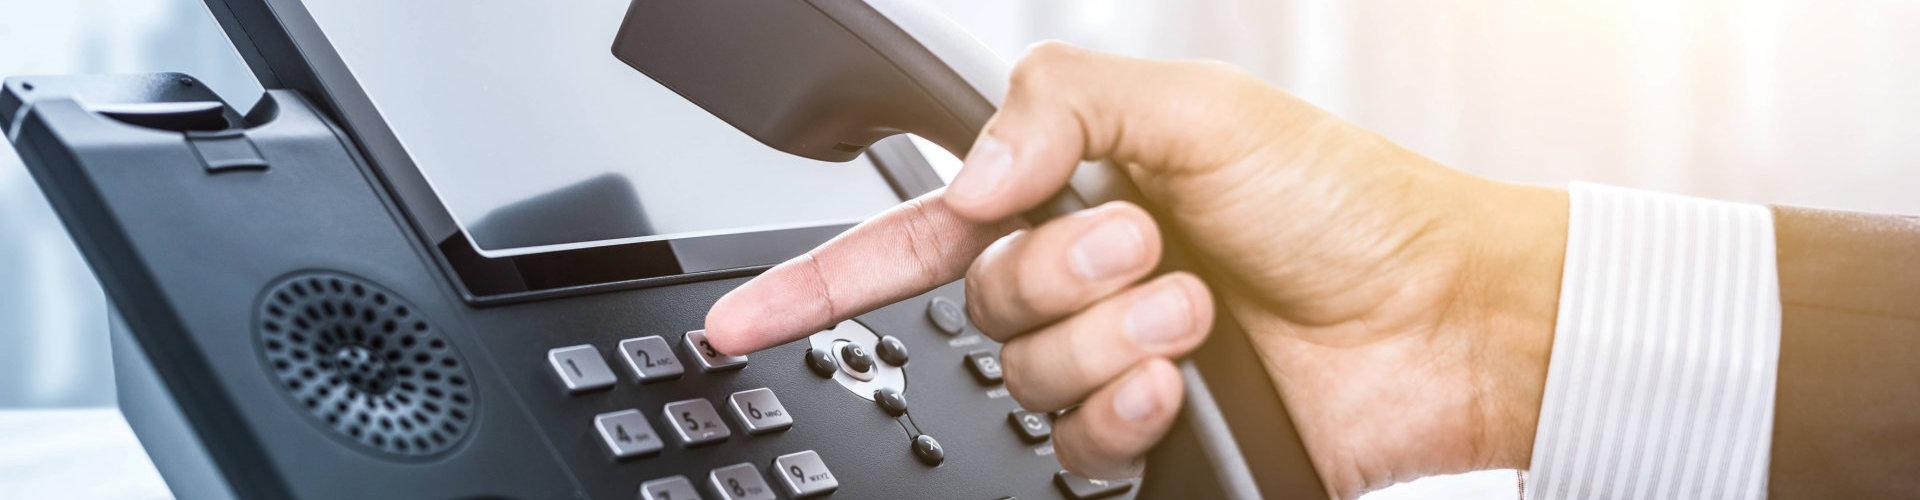 someone using the telephone